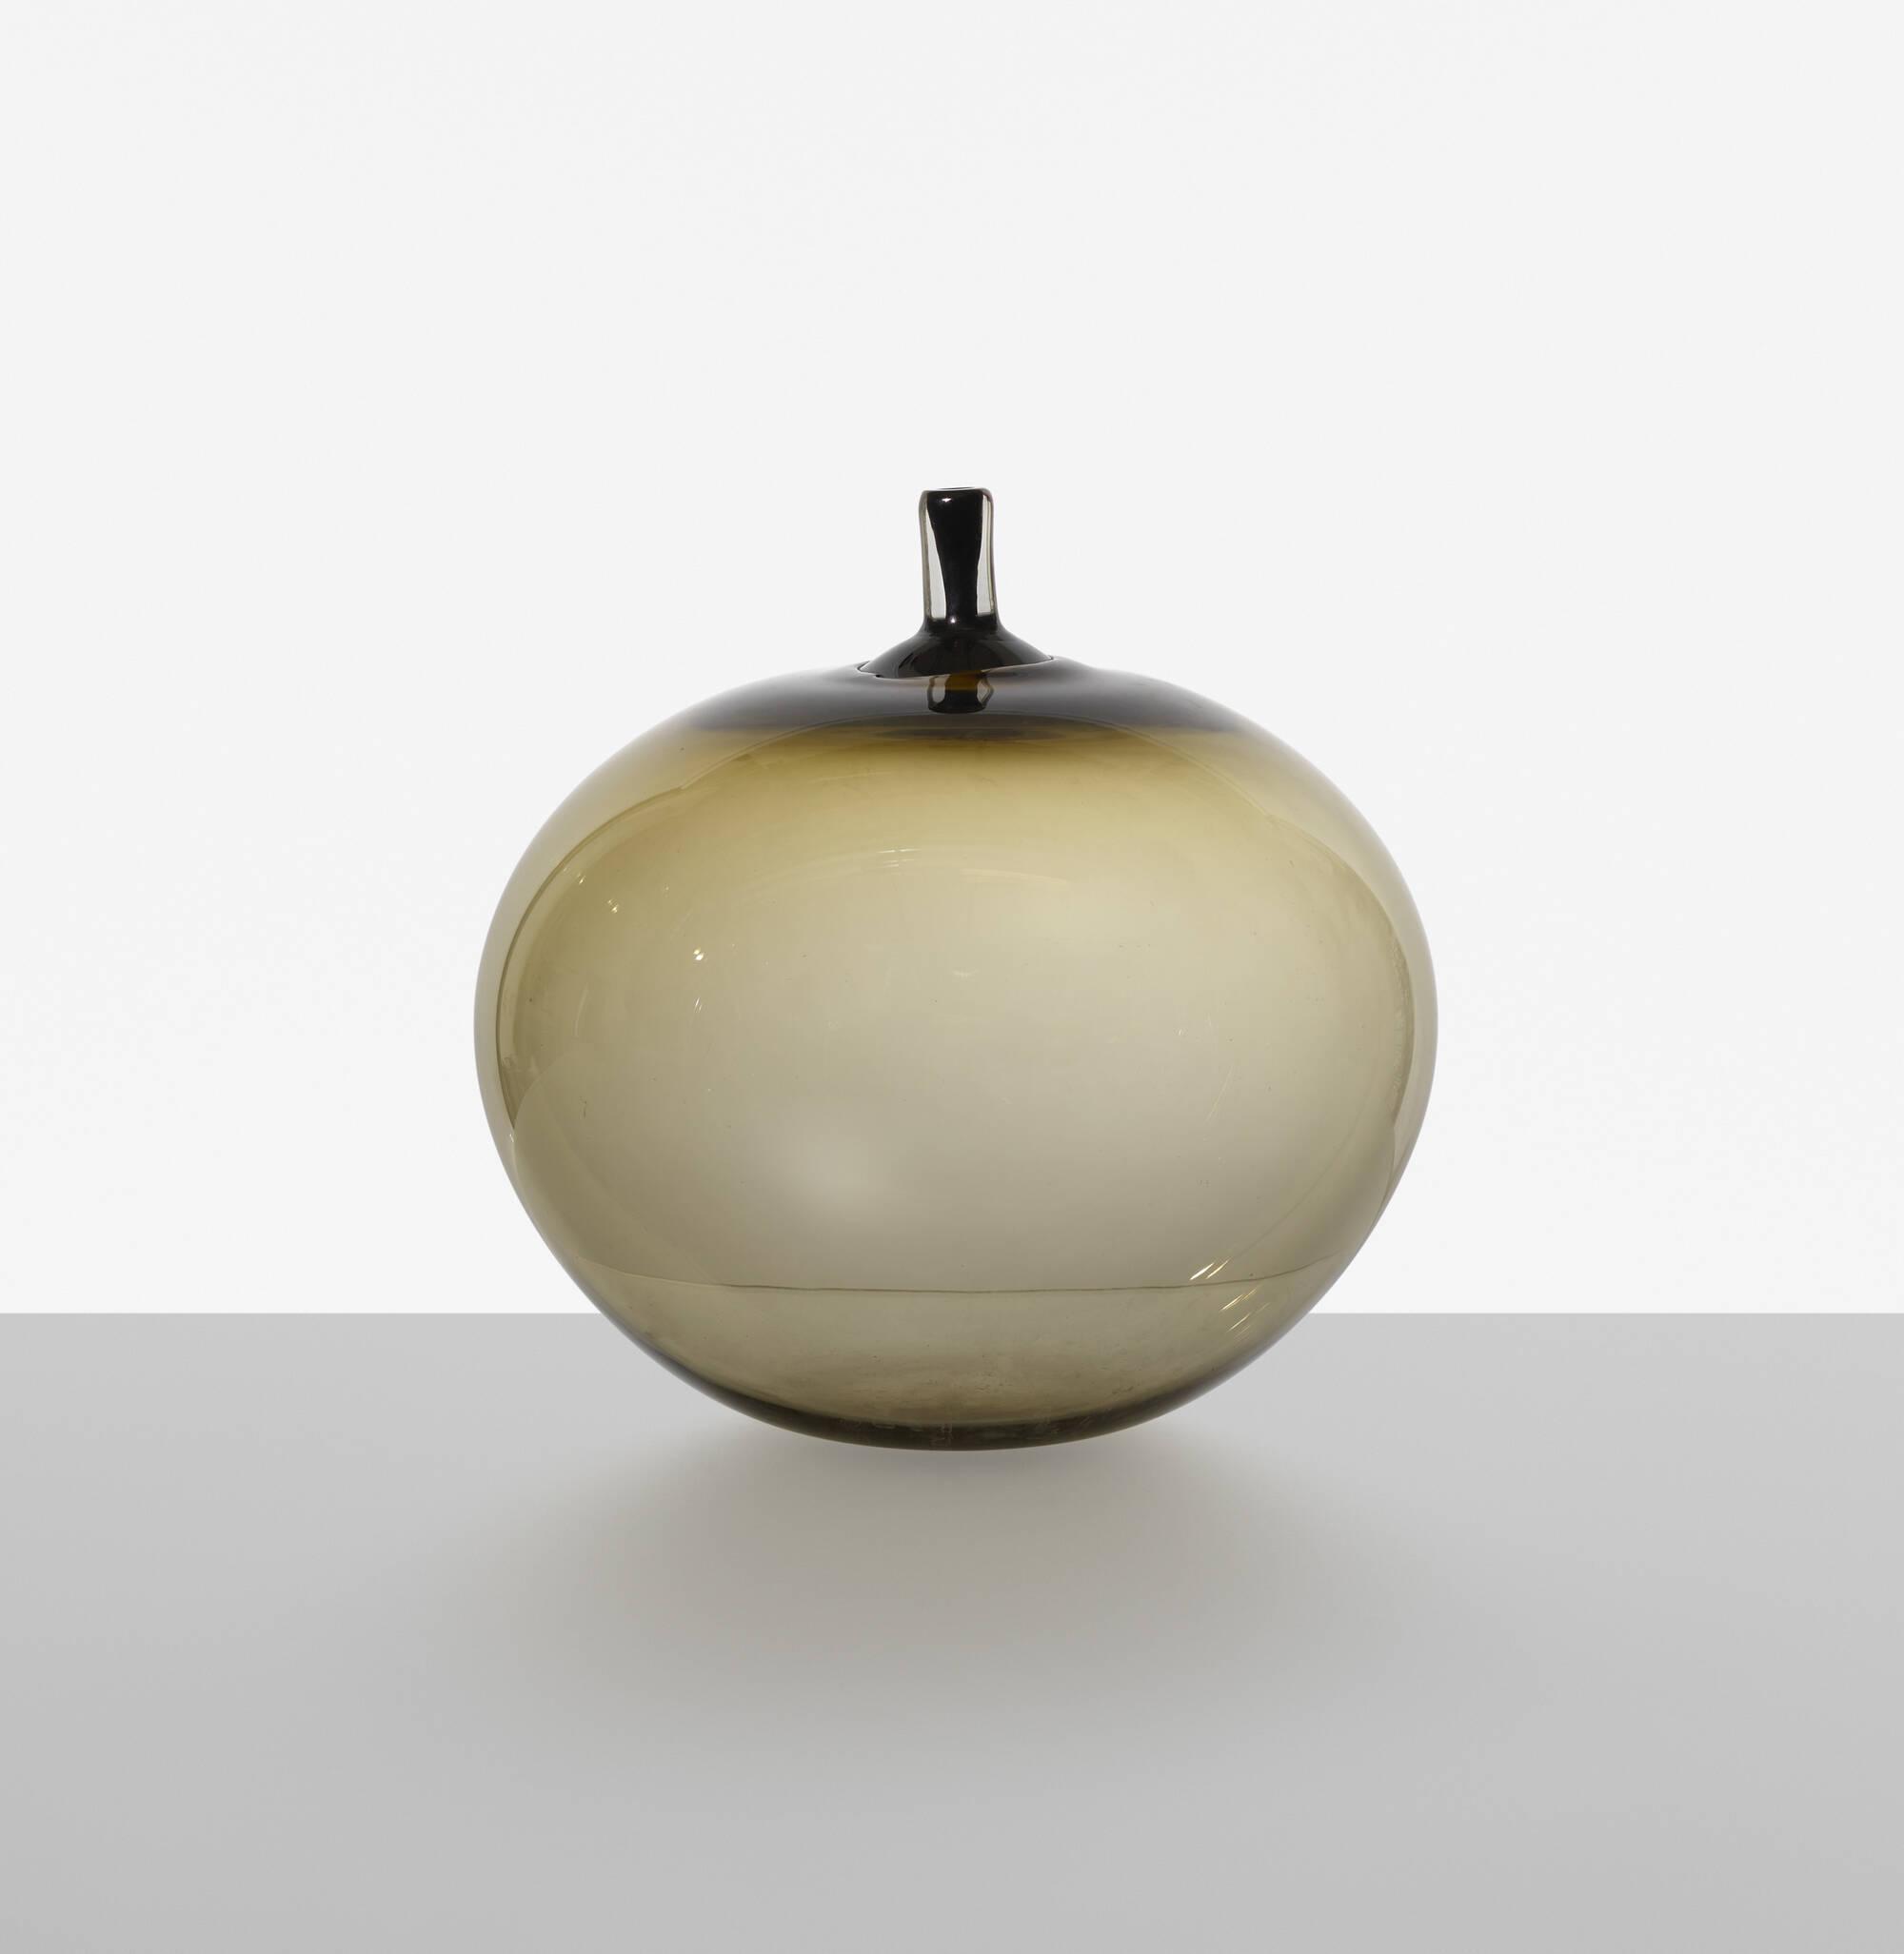 233: Ingeborg Lundin / Apple vase (1 of 2)